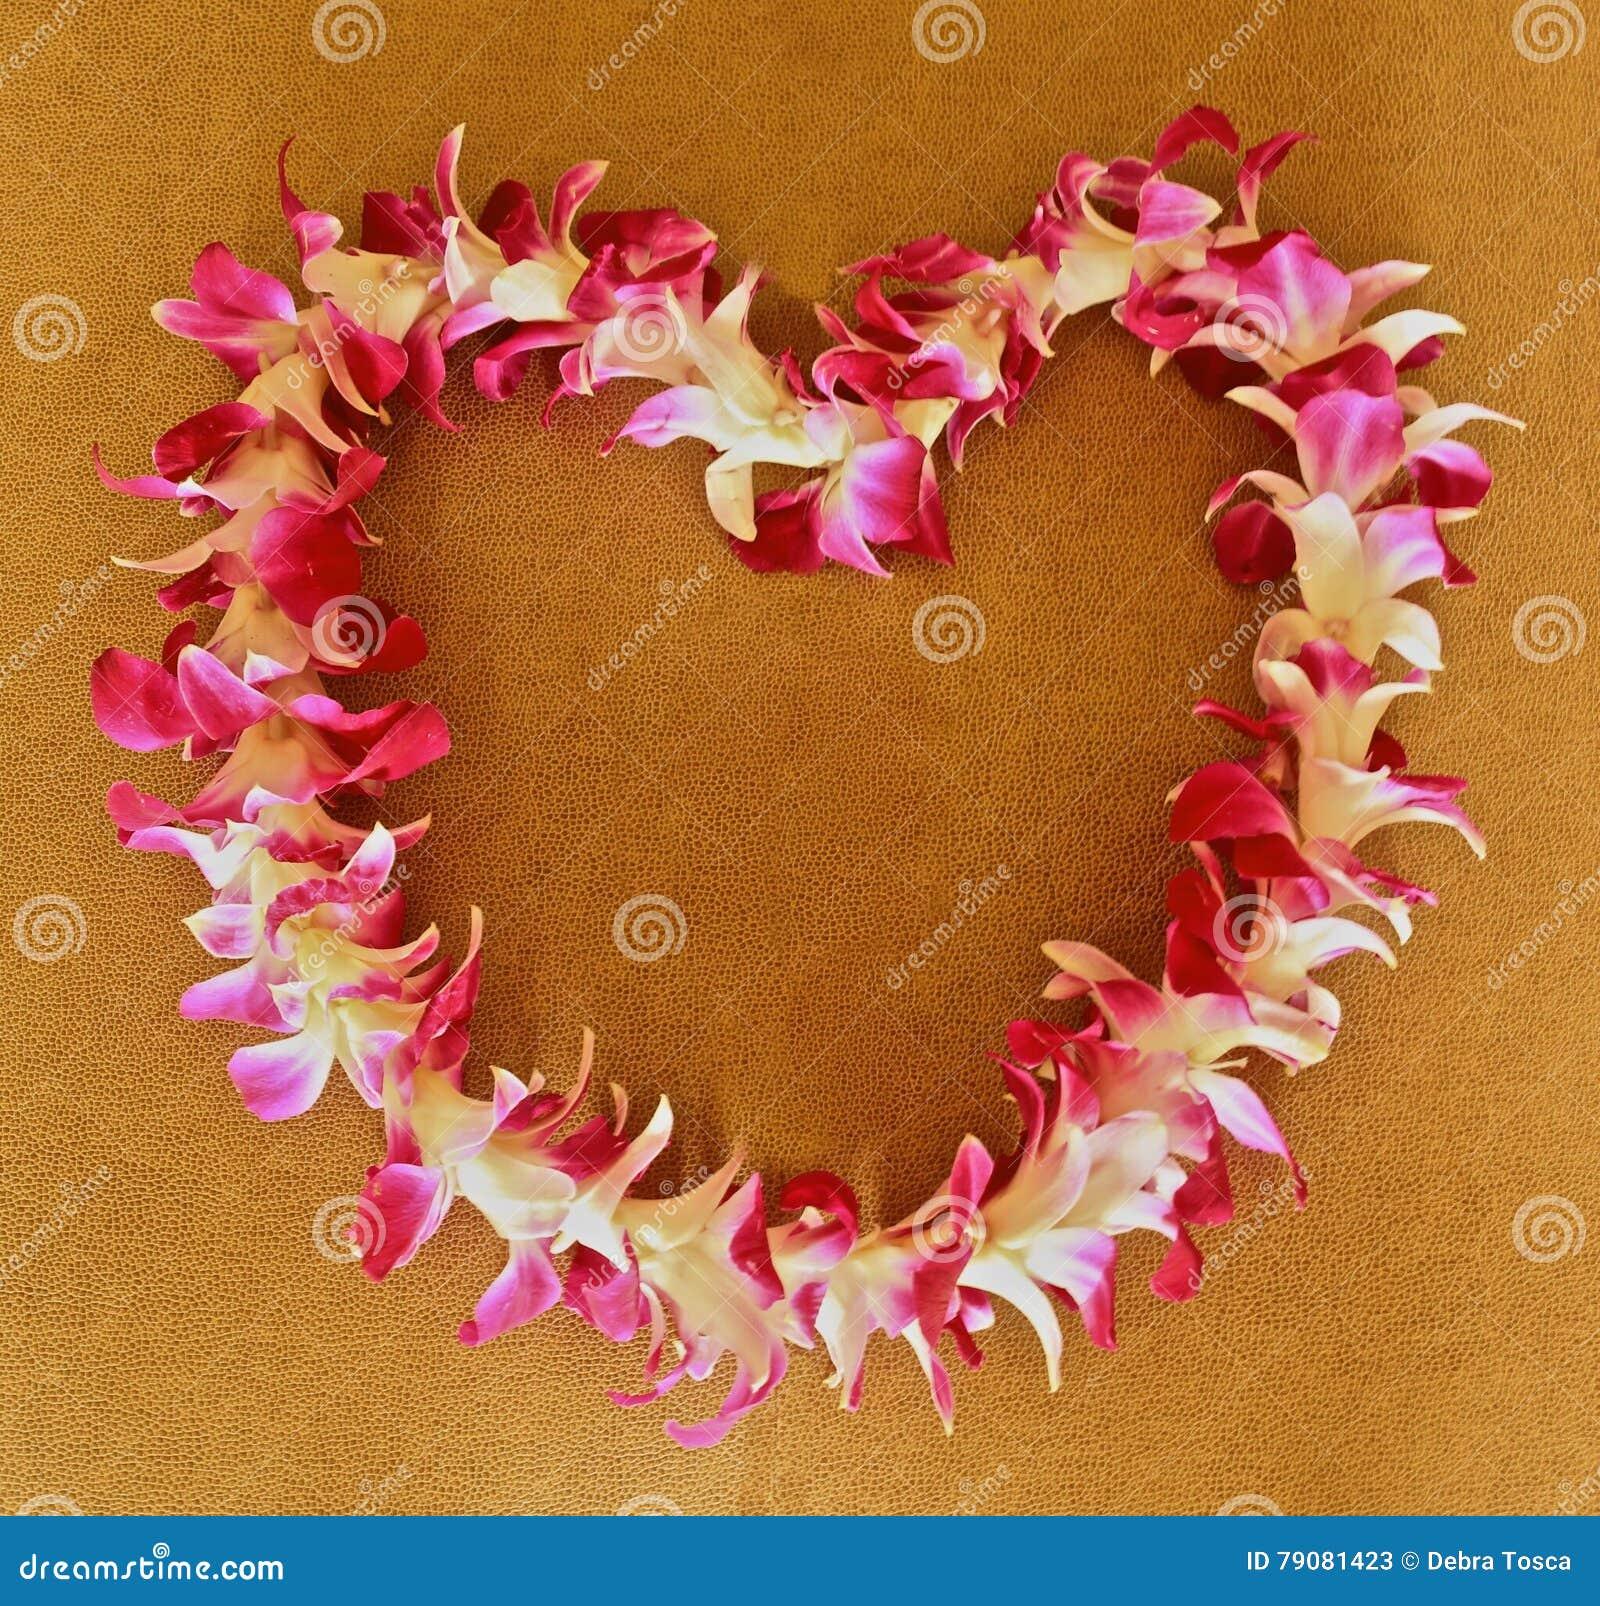 Hawaiian lei stock image image of heart white shaped 79081423 hawaiian lei izmirmasajfo Images